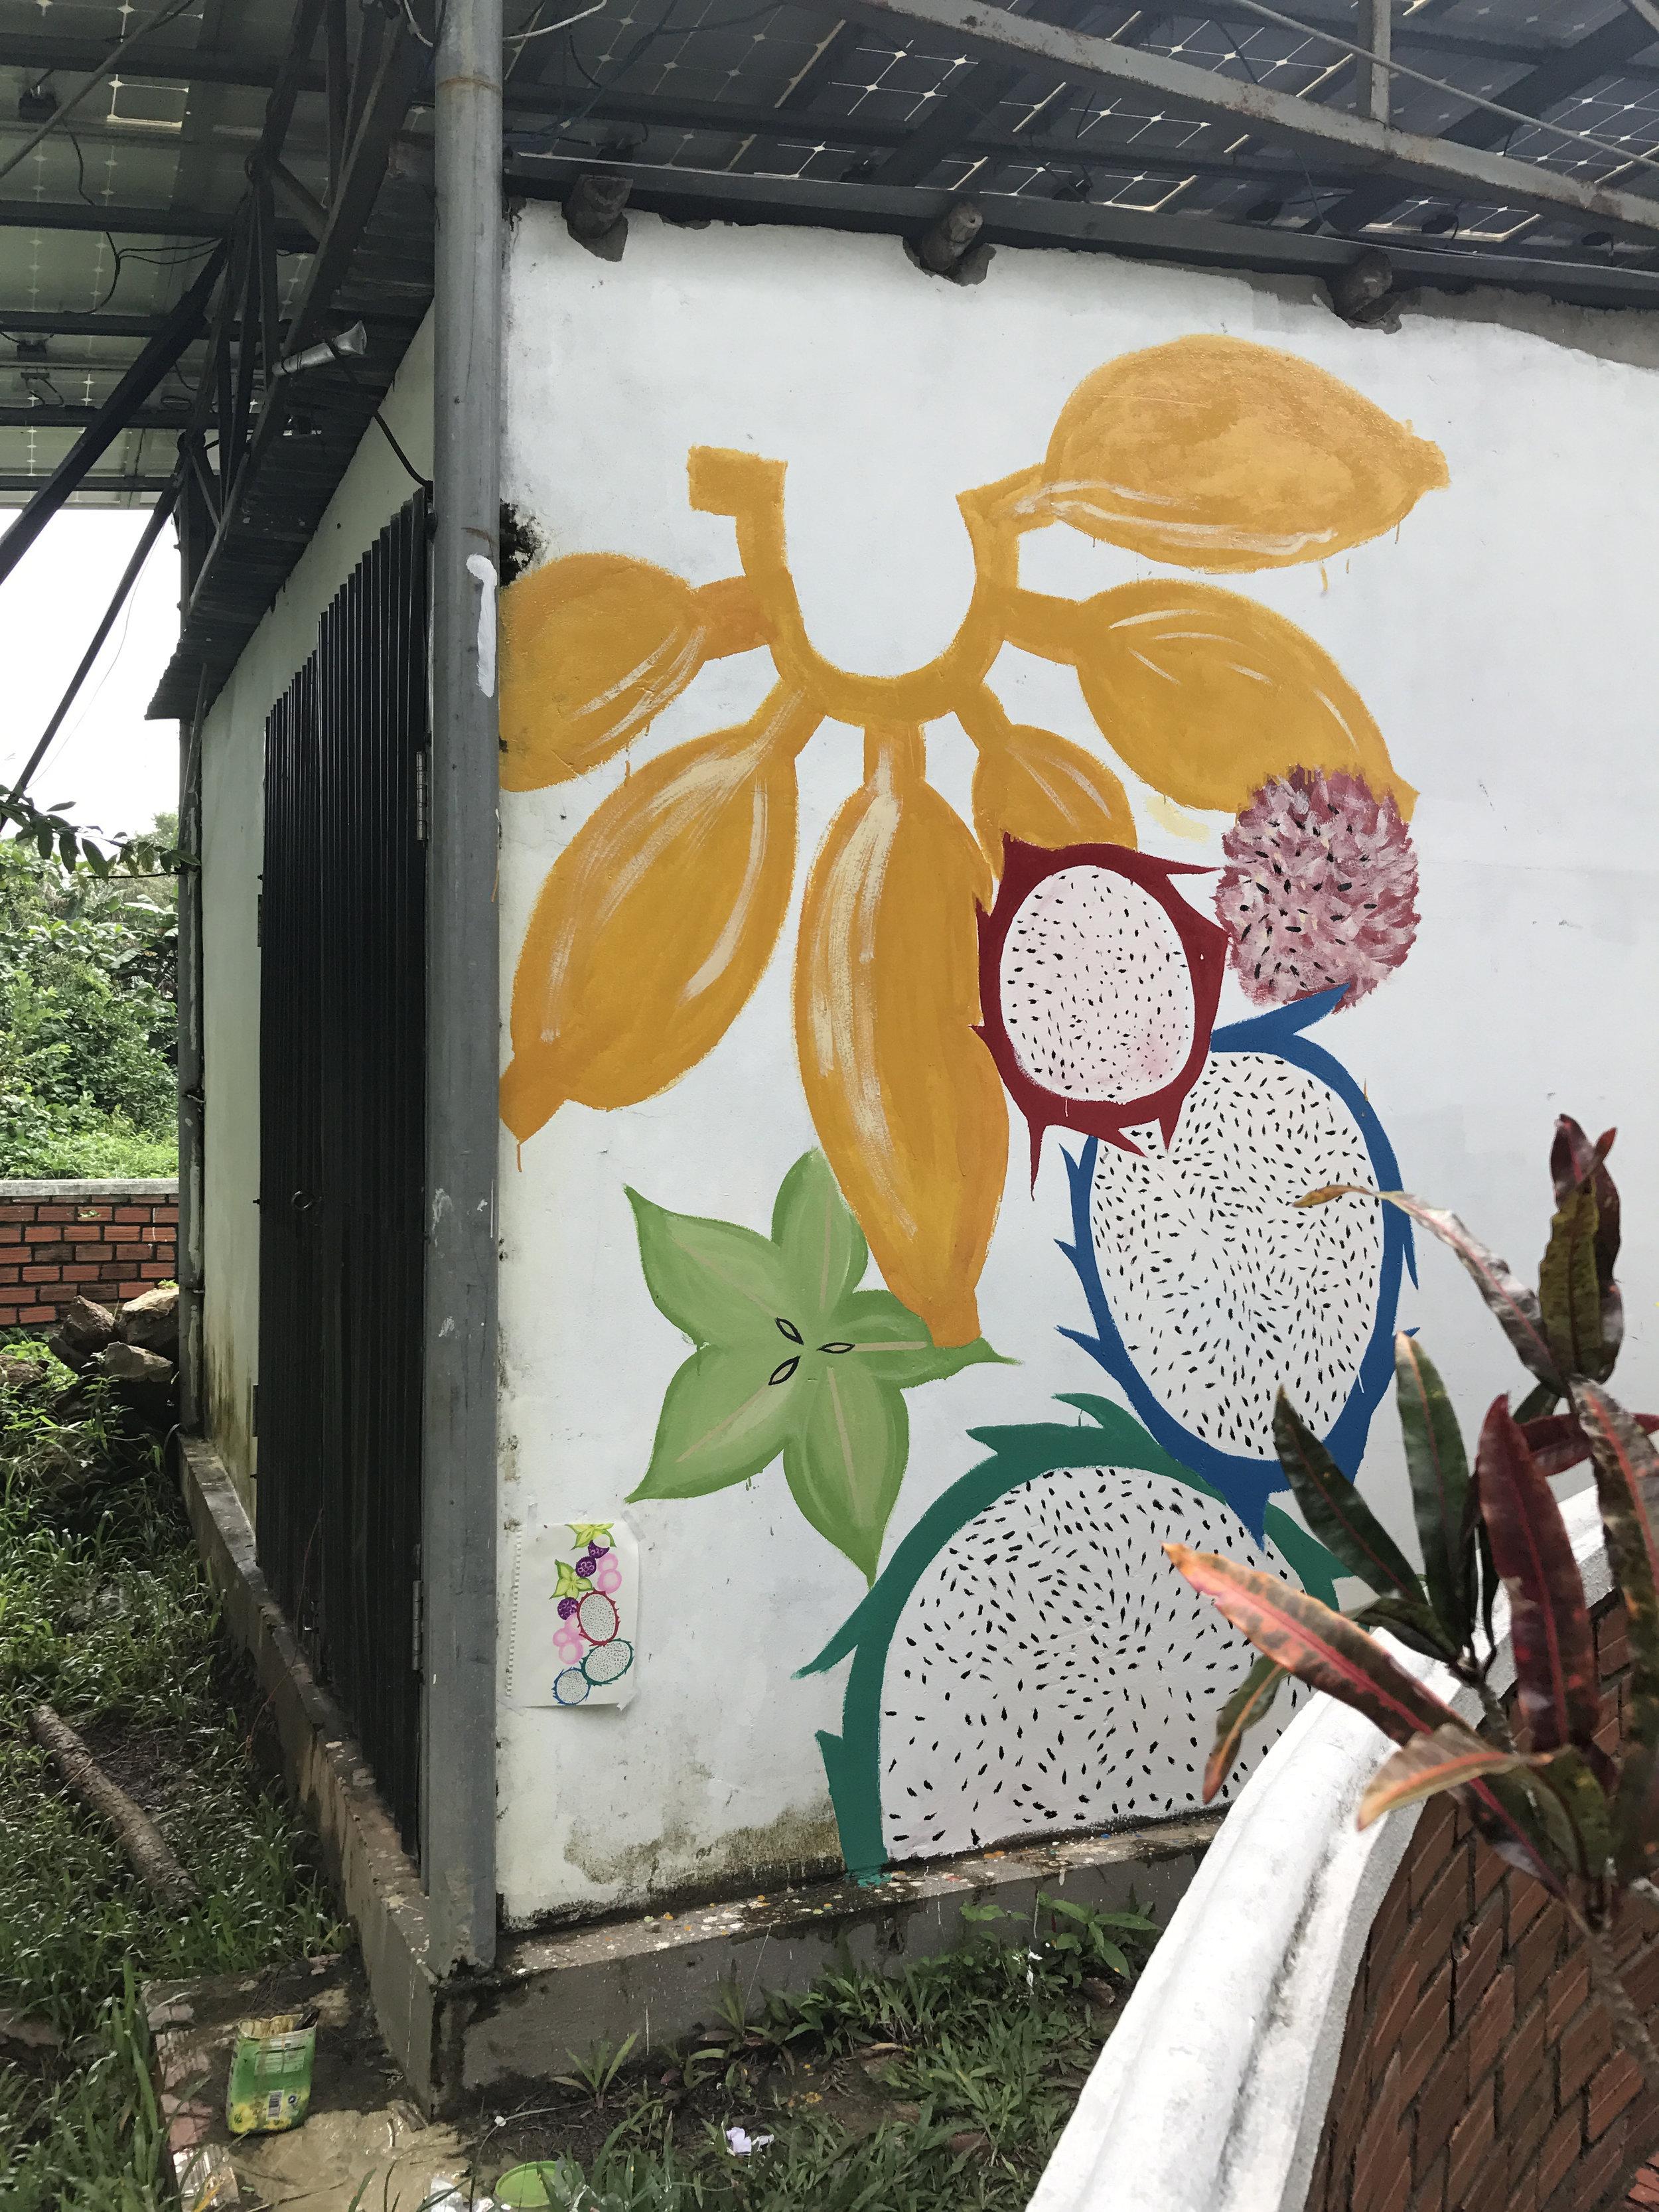 Mural in Phu Quoc Island, Vietnam 2017